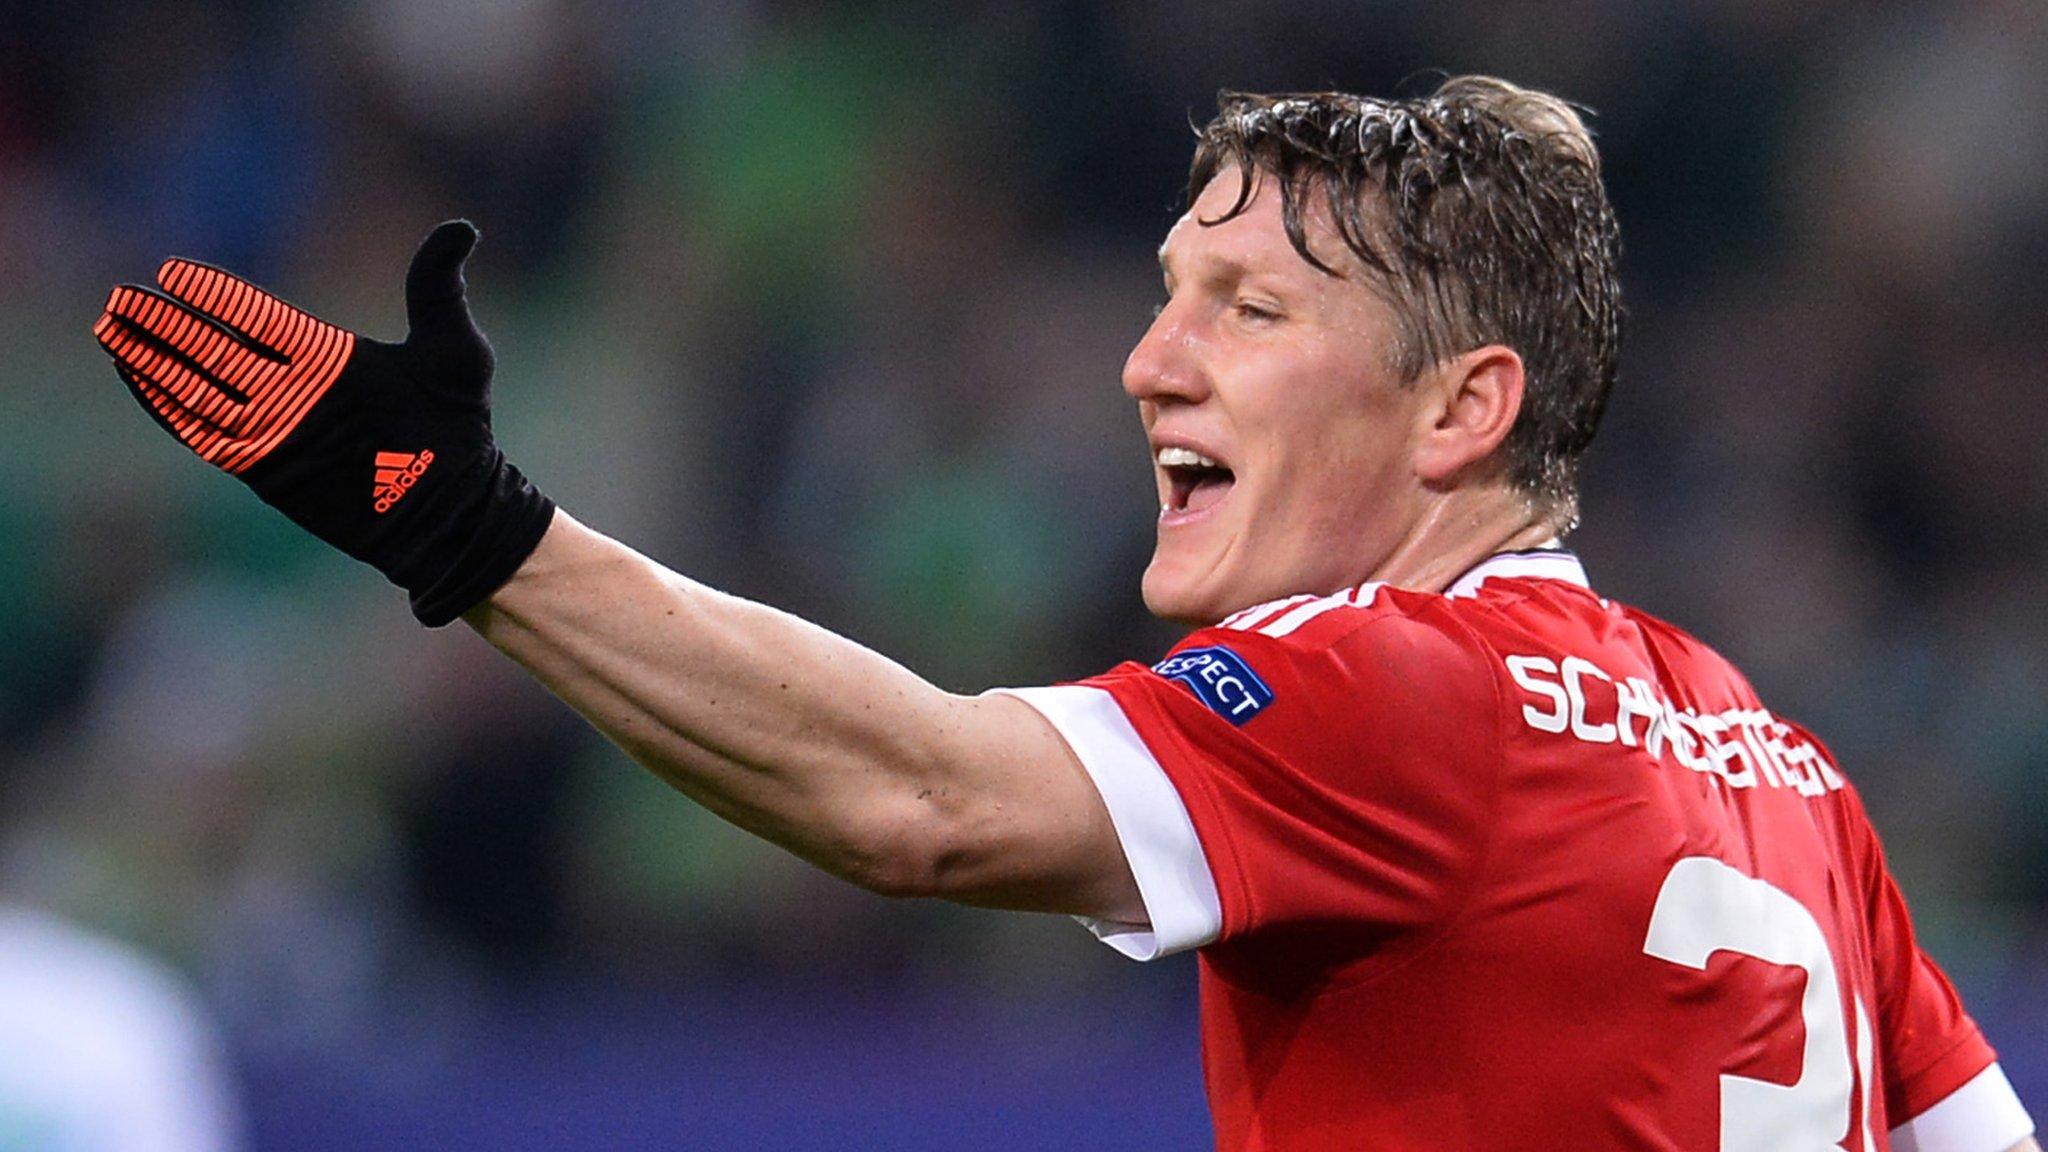 Watch: 'Very difficult' for Schweinsteiger at Man Utd - Mourinho